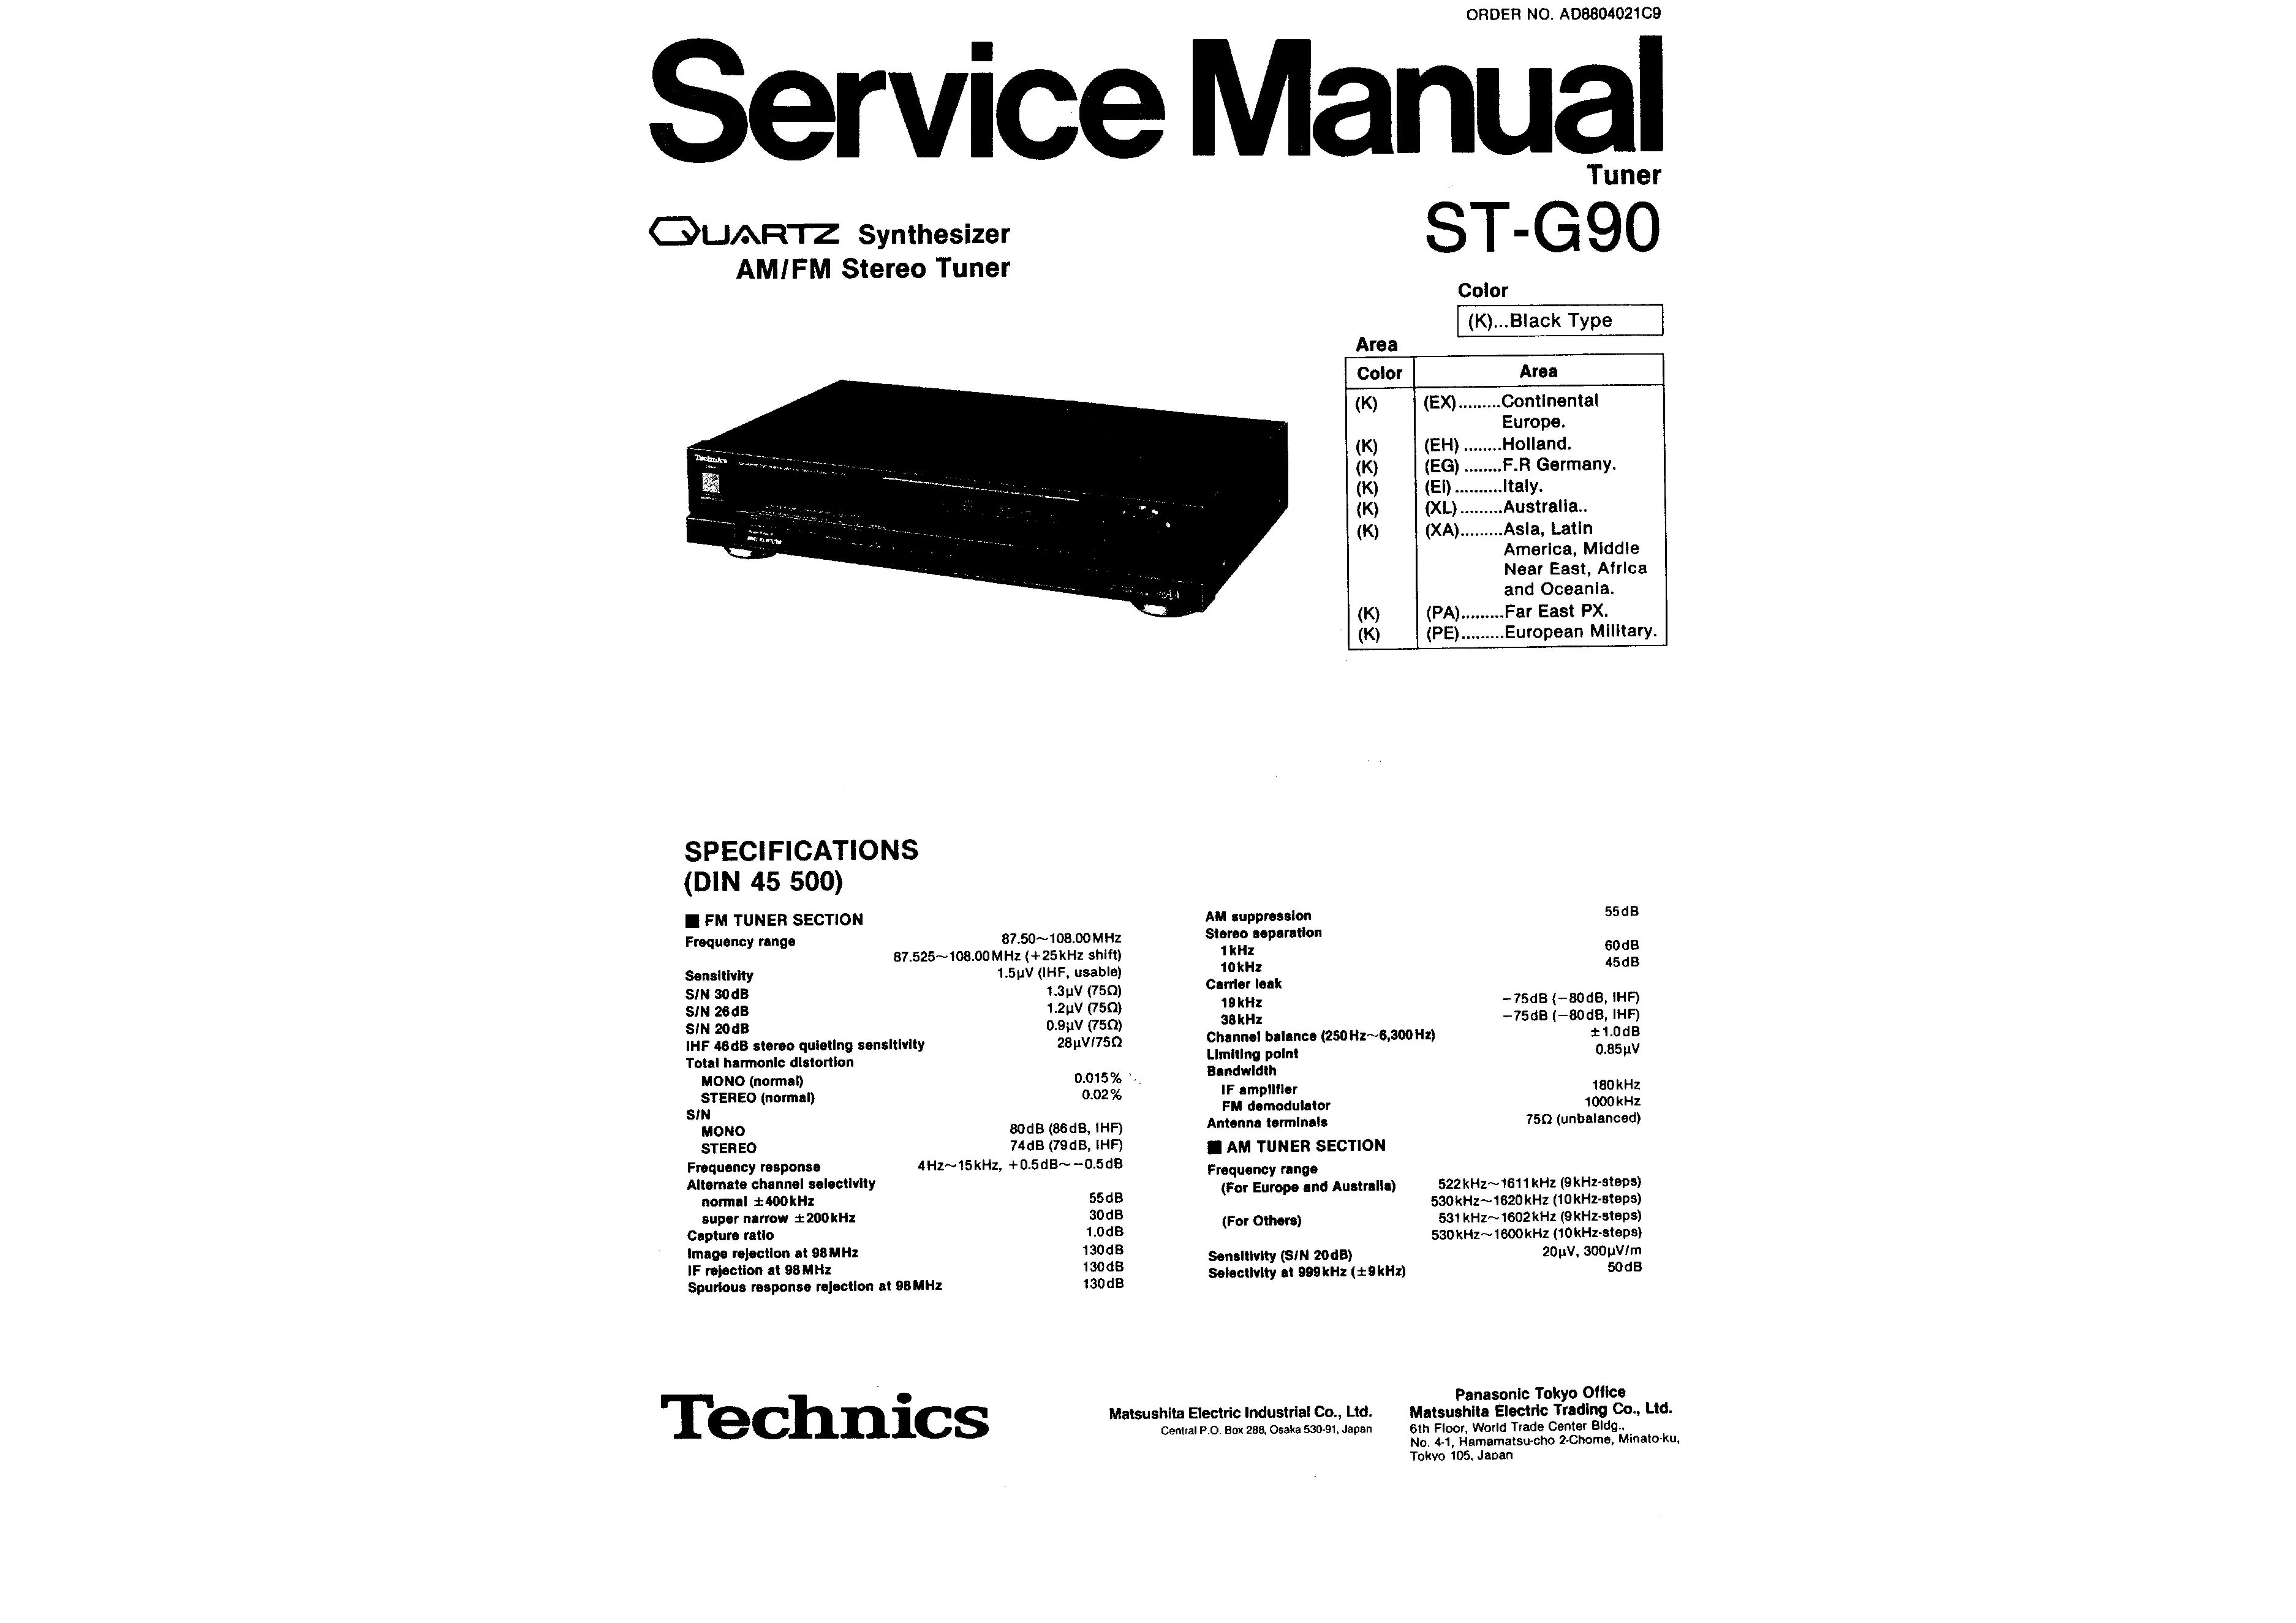 Service Manual For Technics Stg90